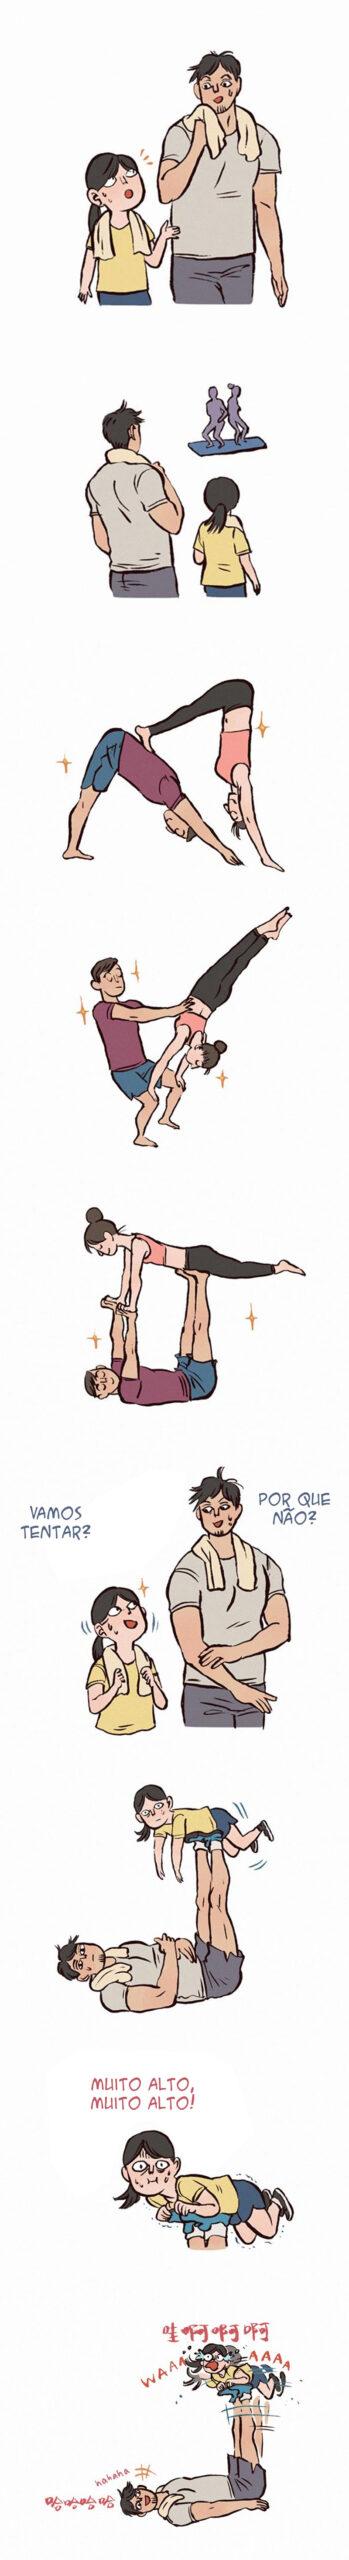 Um casal divertido se exercitando junto